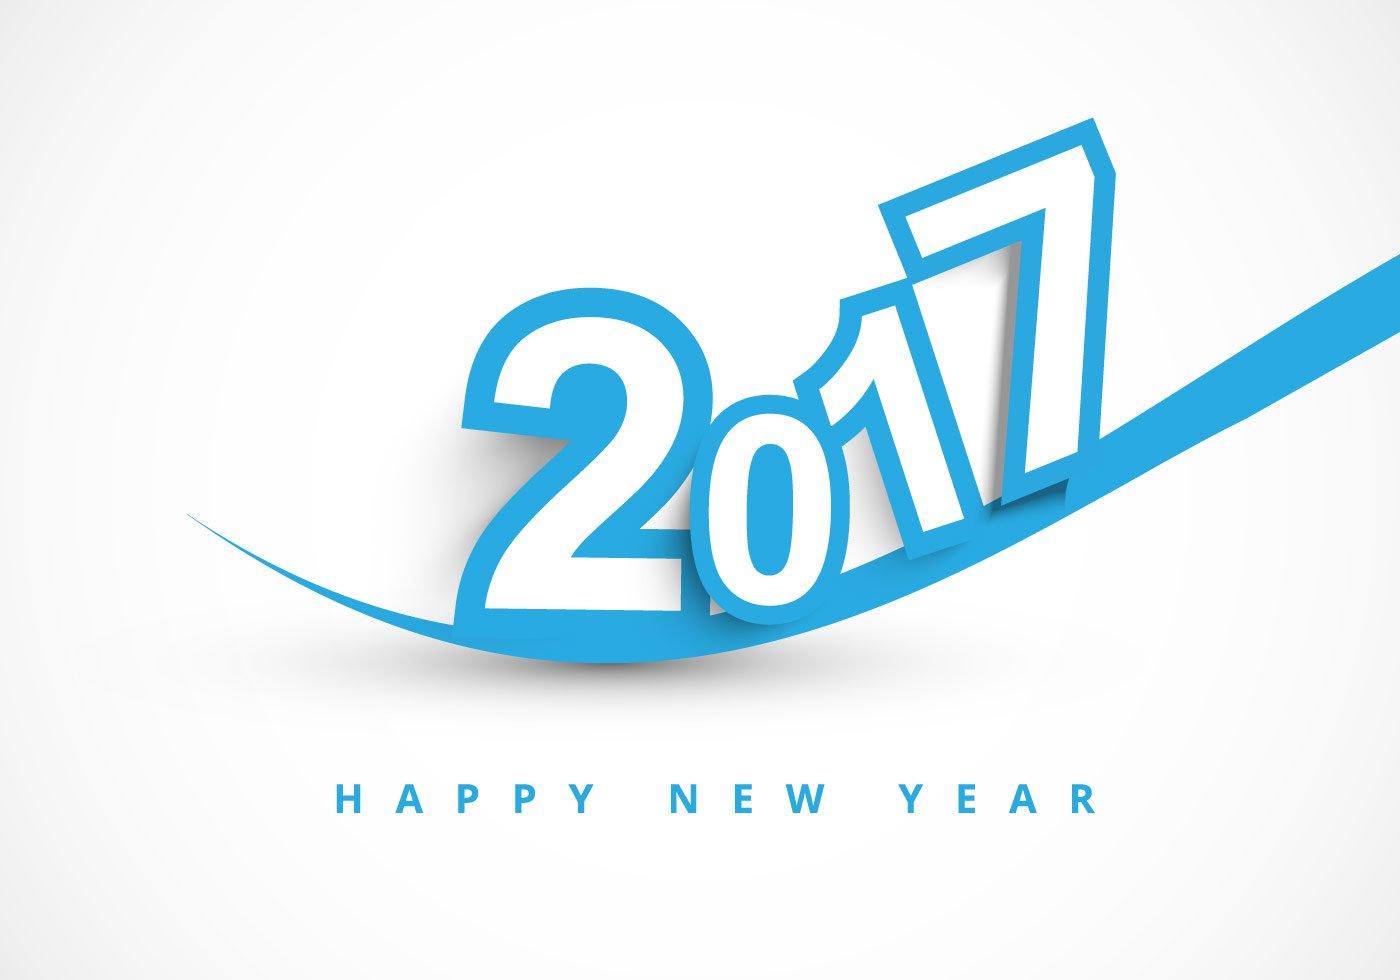 Best-New-Year-2017-Wallpaper